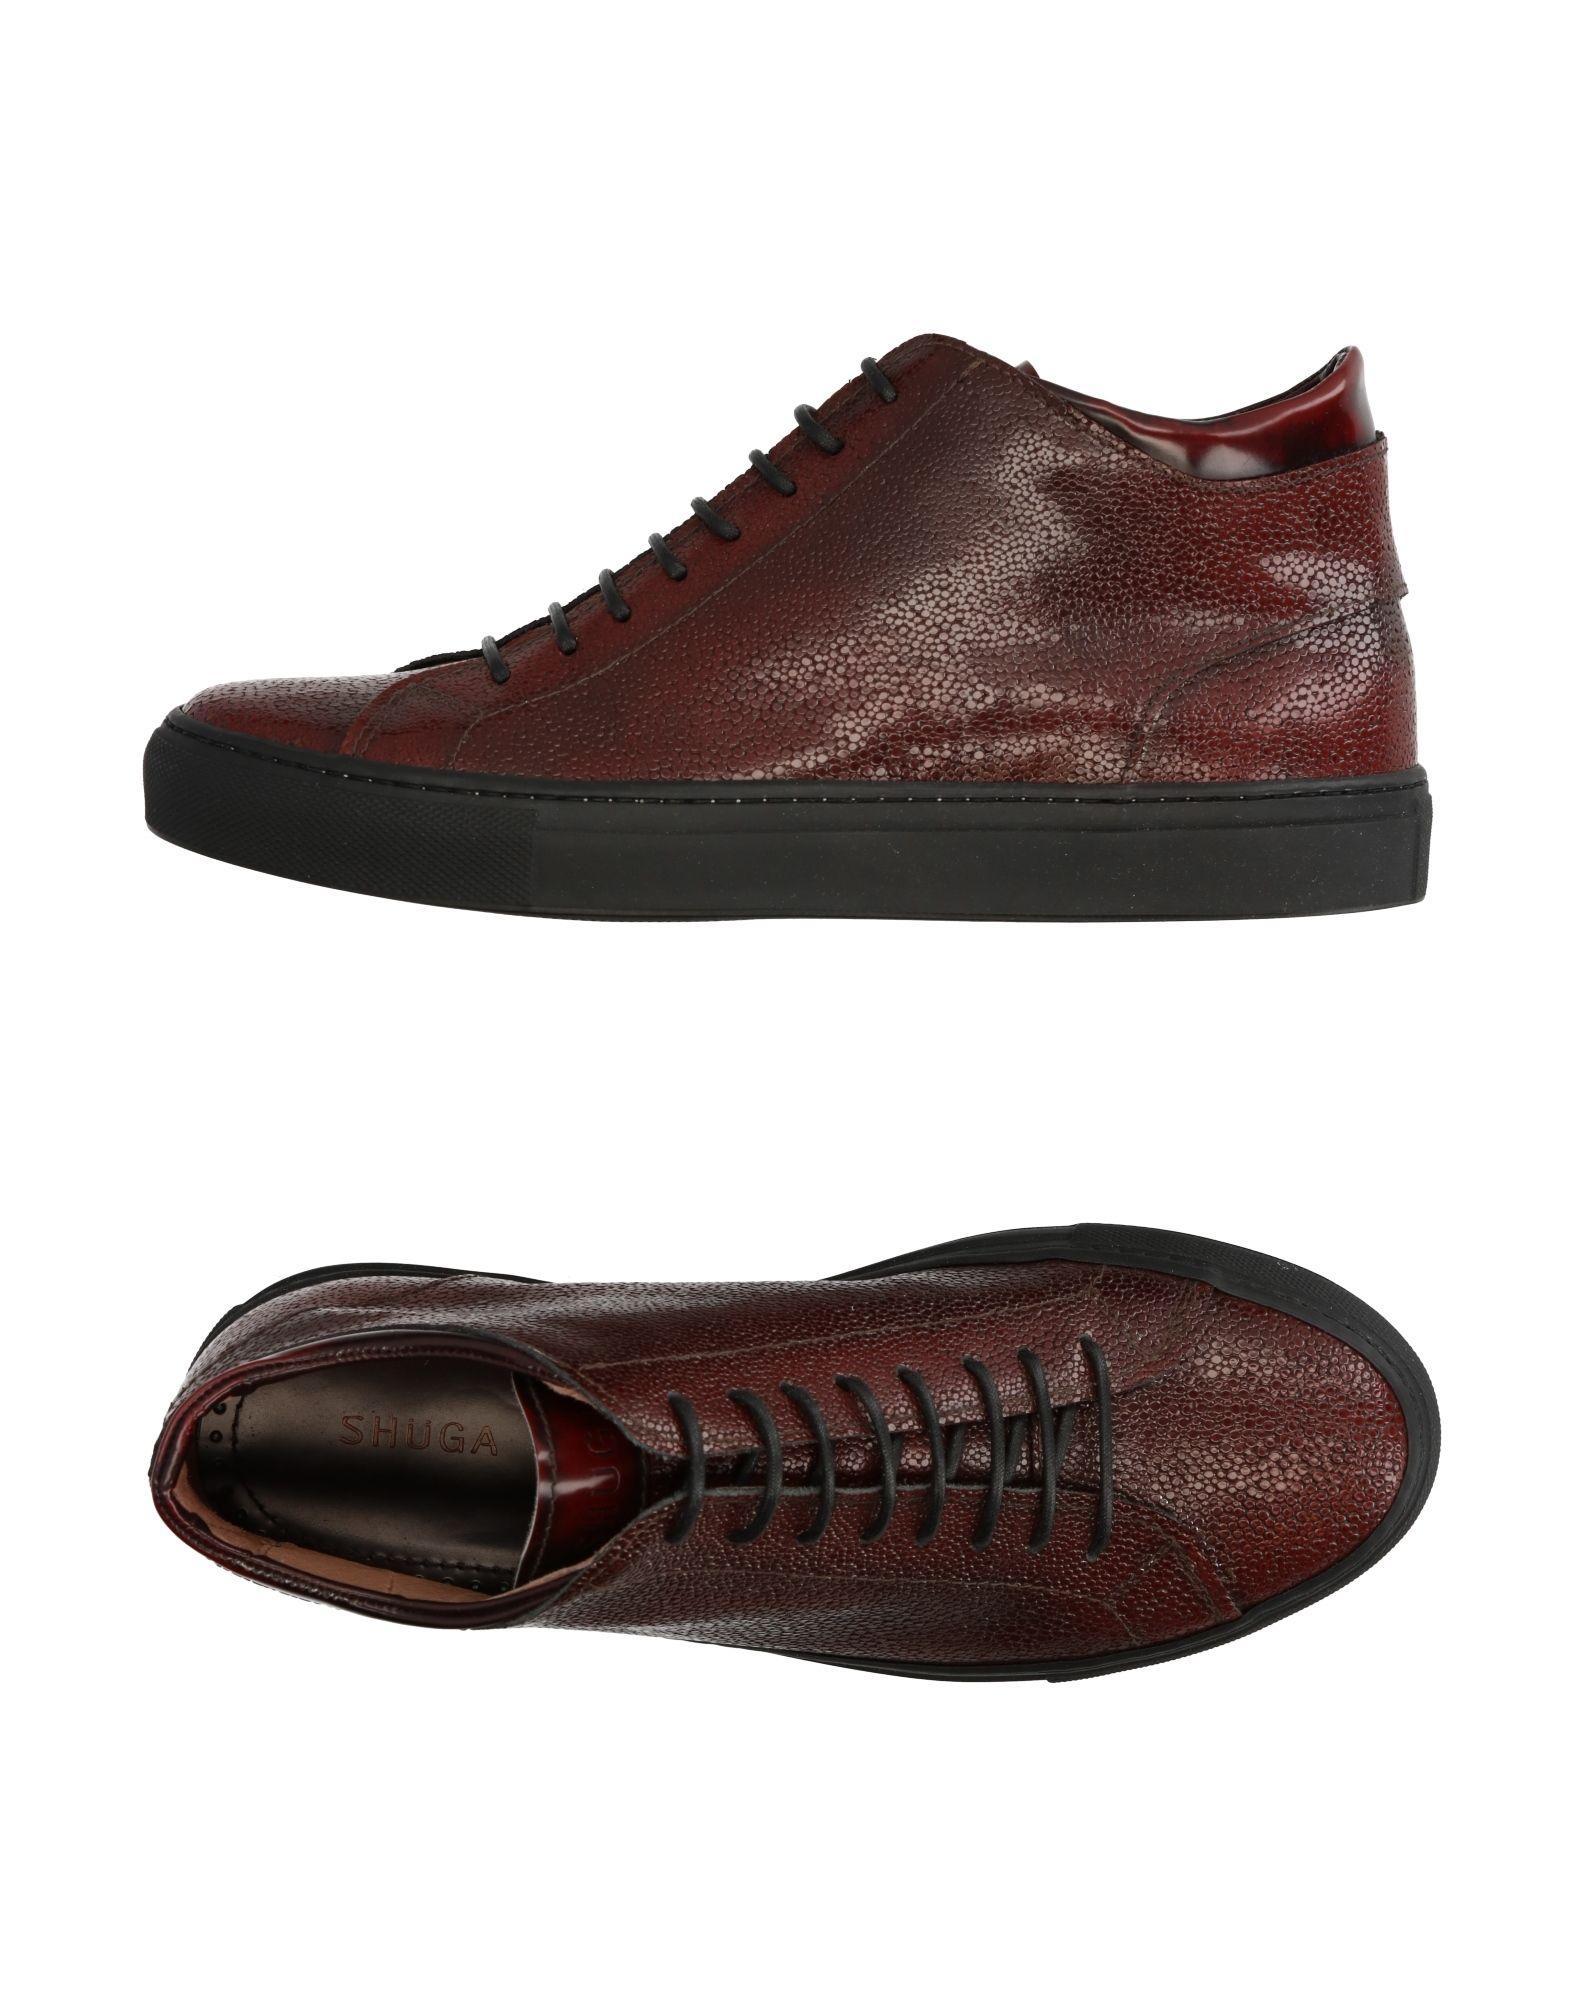 SHUGA Высокие кеды и кроссовки кеды кроссовки высокие dc council mid tx stone camo